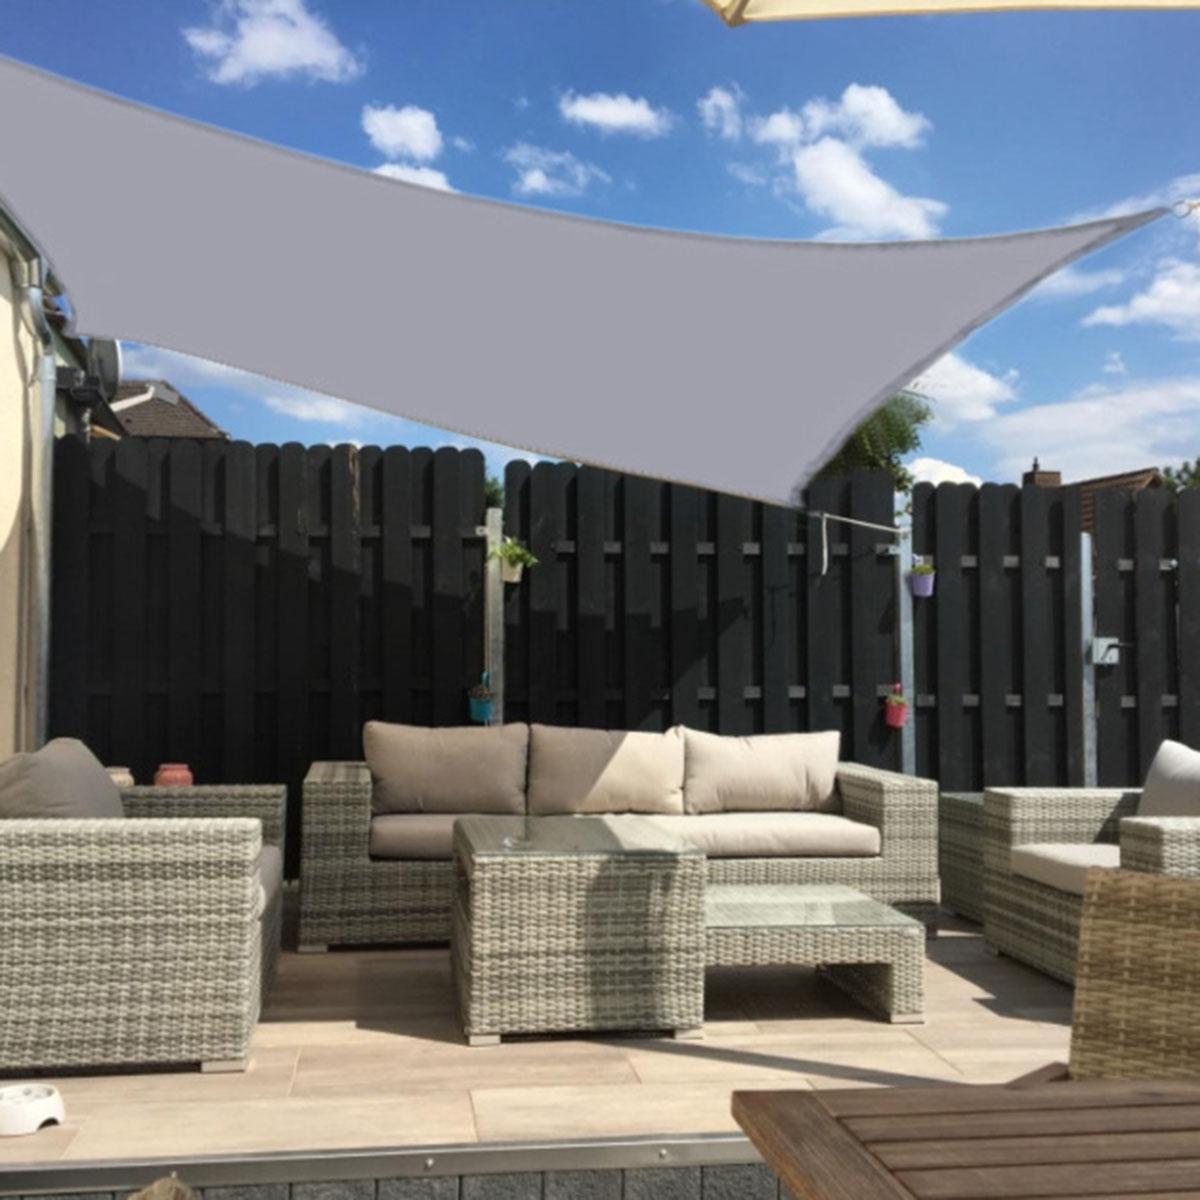 4x3m Waterproof Sun Shade Sail UV Proof Block Outdoor Canopy Patio Garden Yard Pool Cover